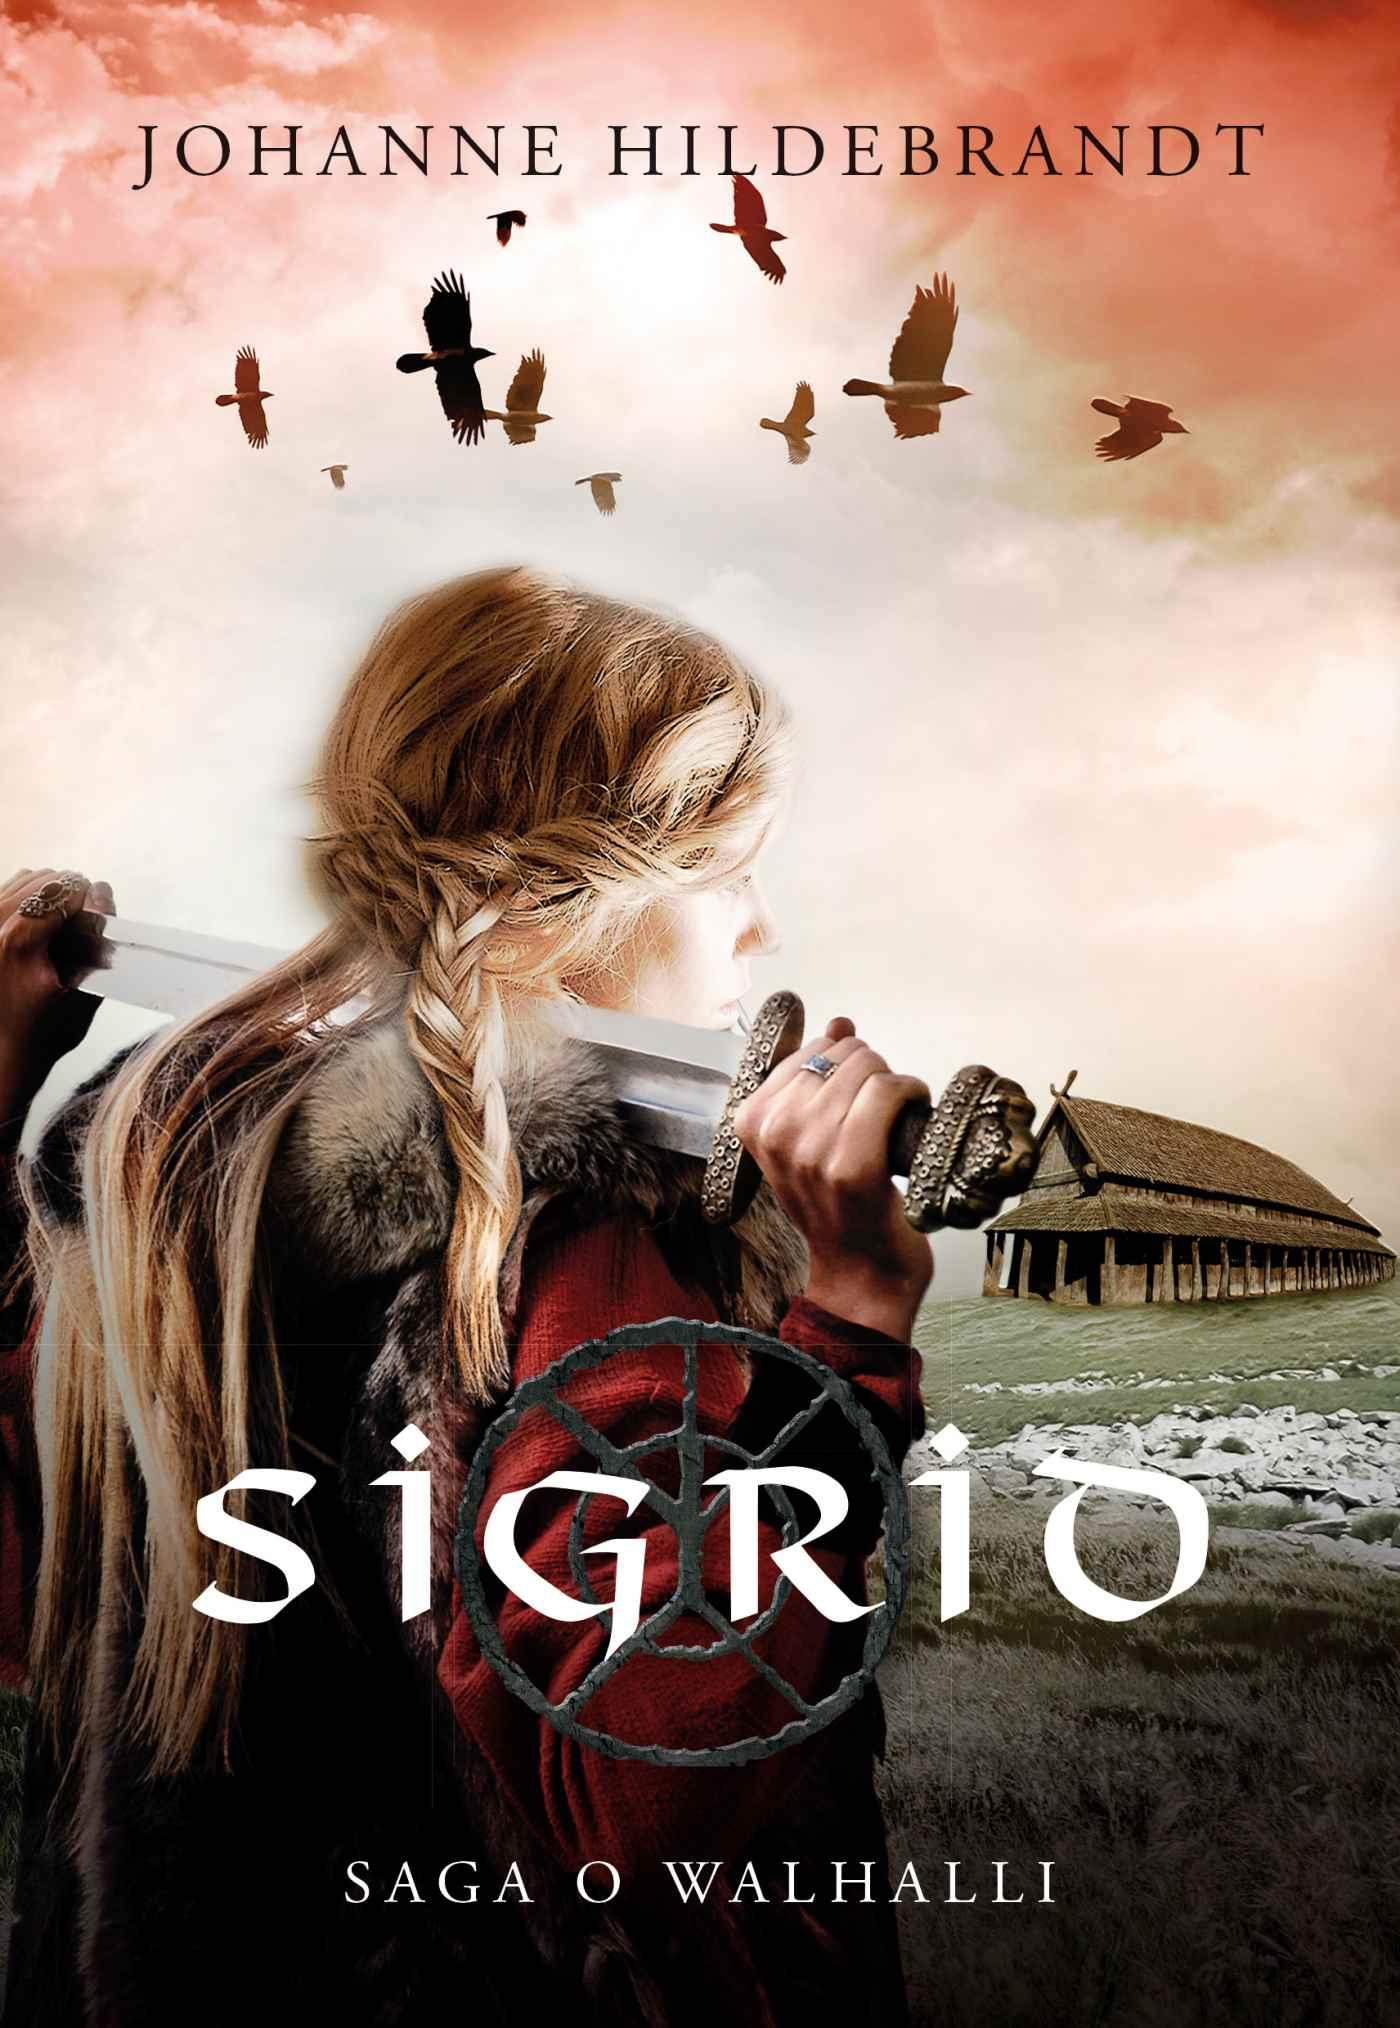 Saga o Walhalli 1. Sigrid - Ebook (Książka EPUB) do pobrania w formacie EPUB